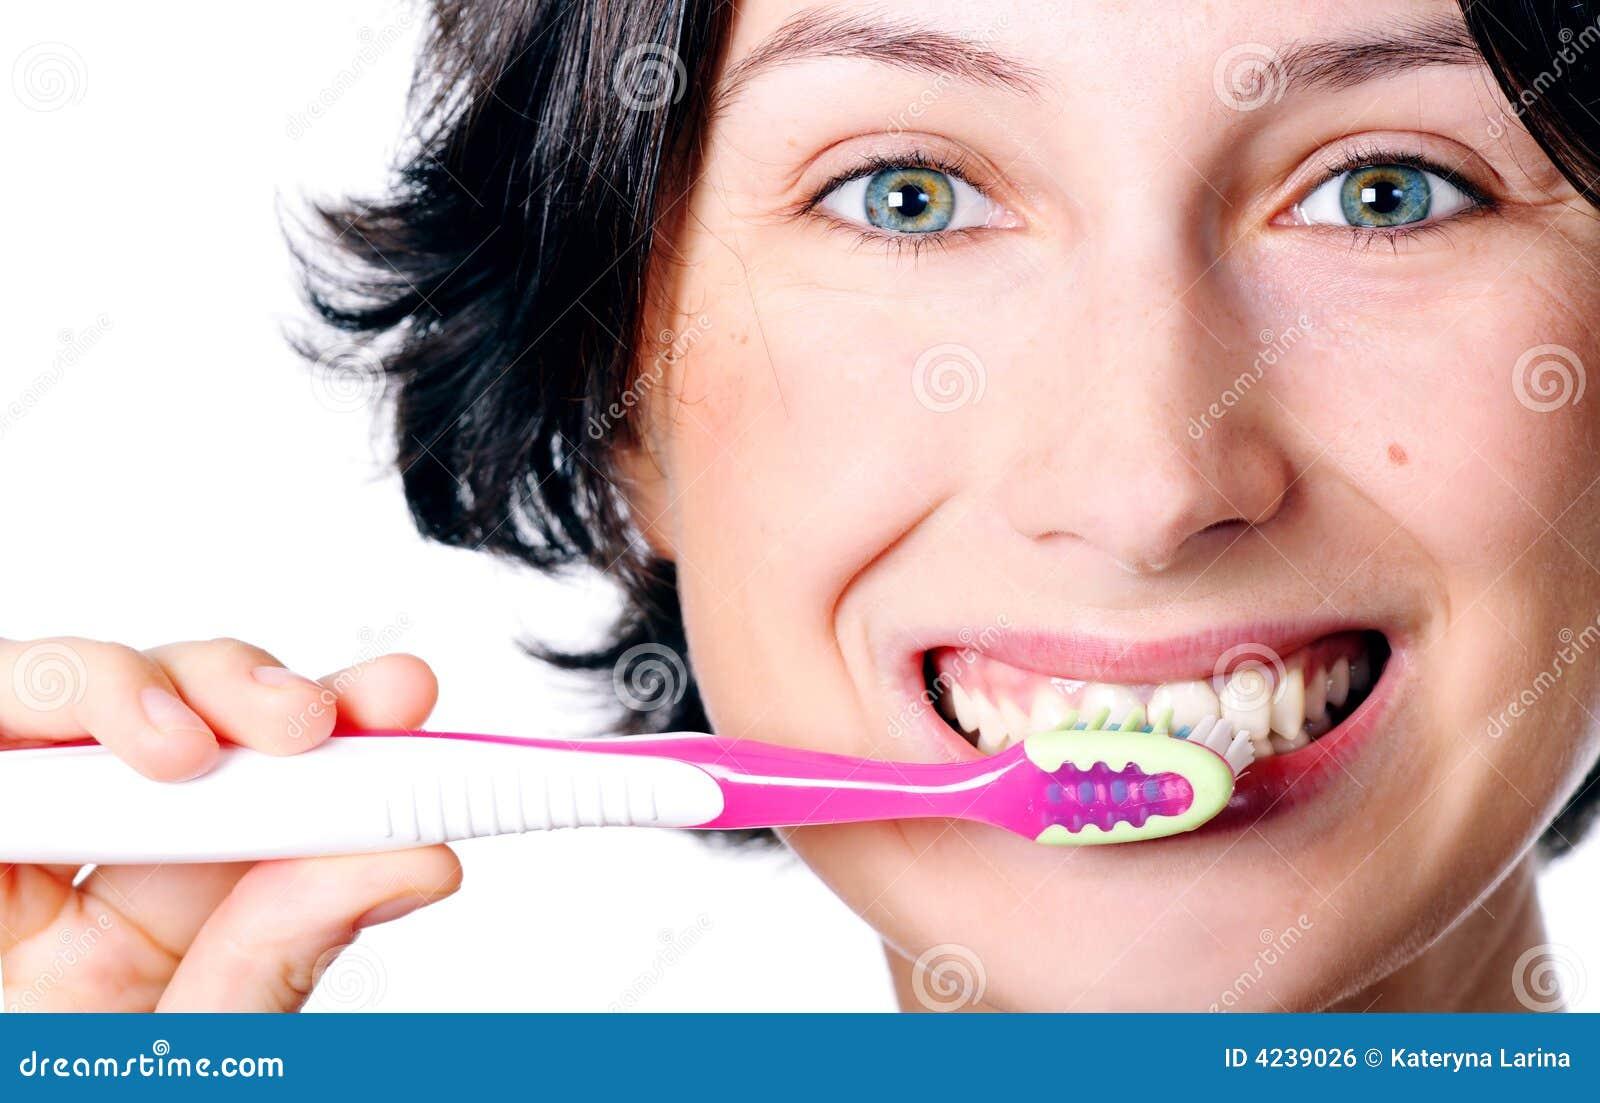 нет дантиста